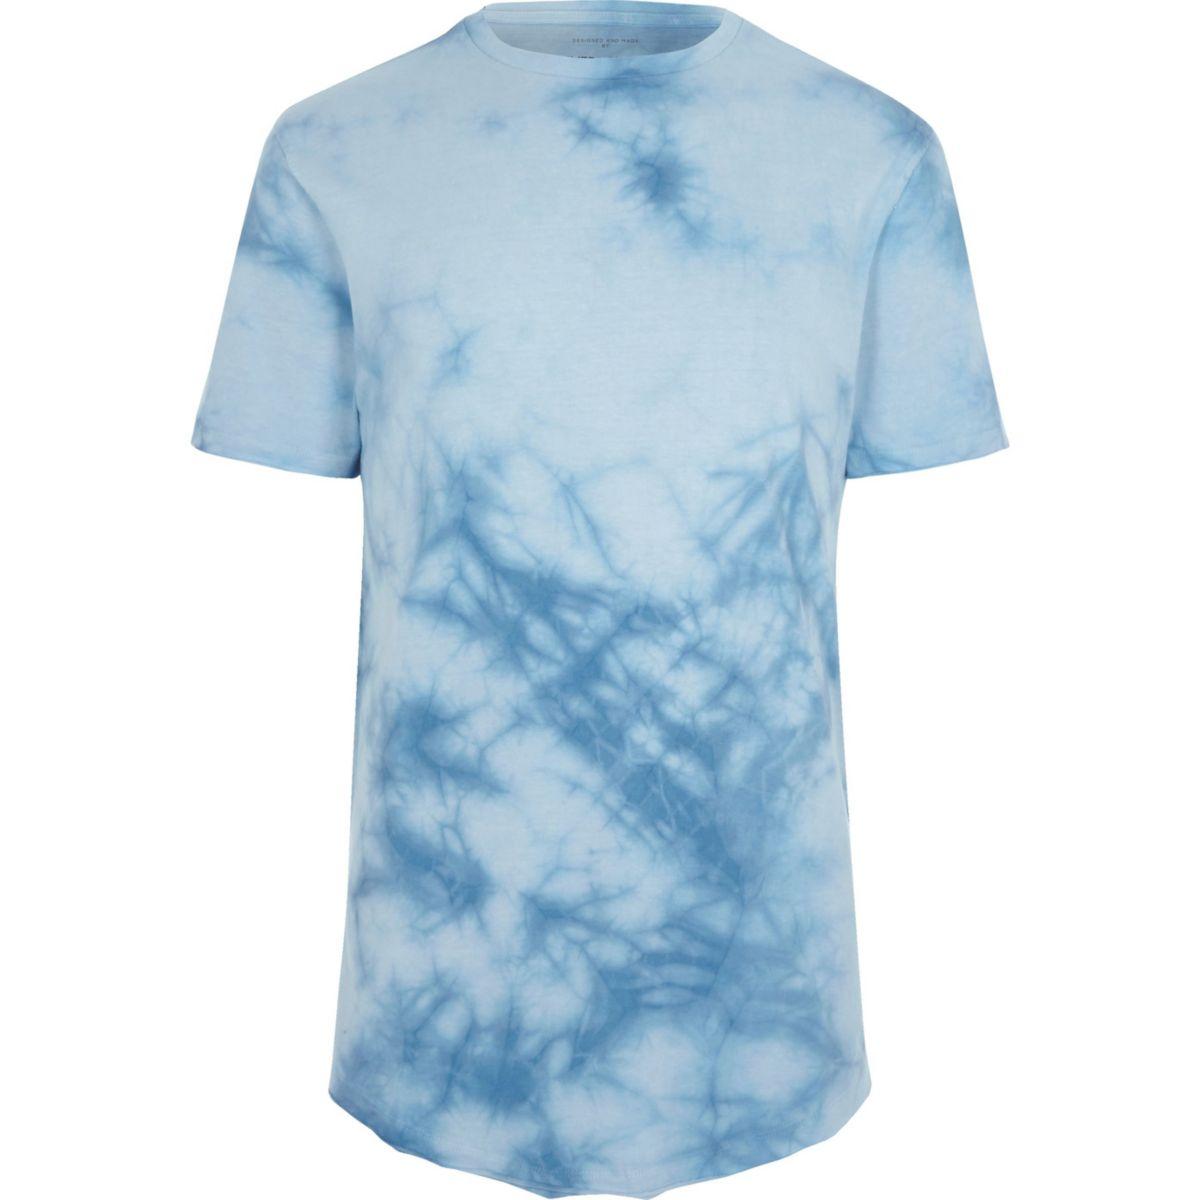 Blue tie dye slim fit T-shirt